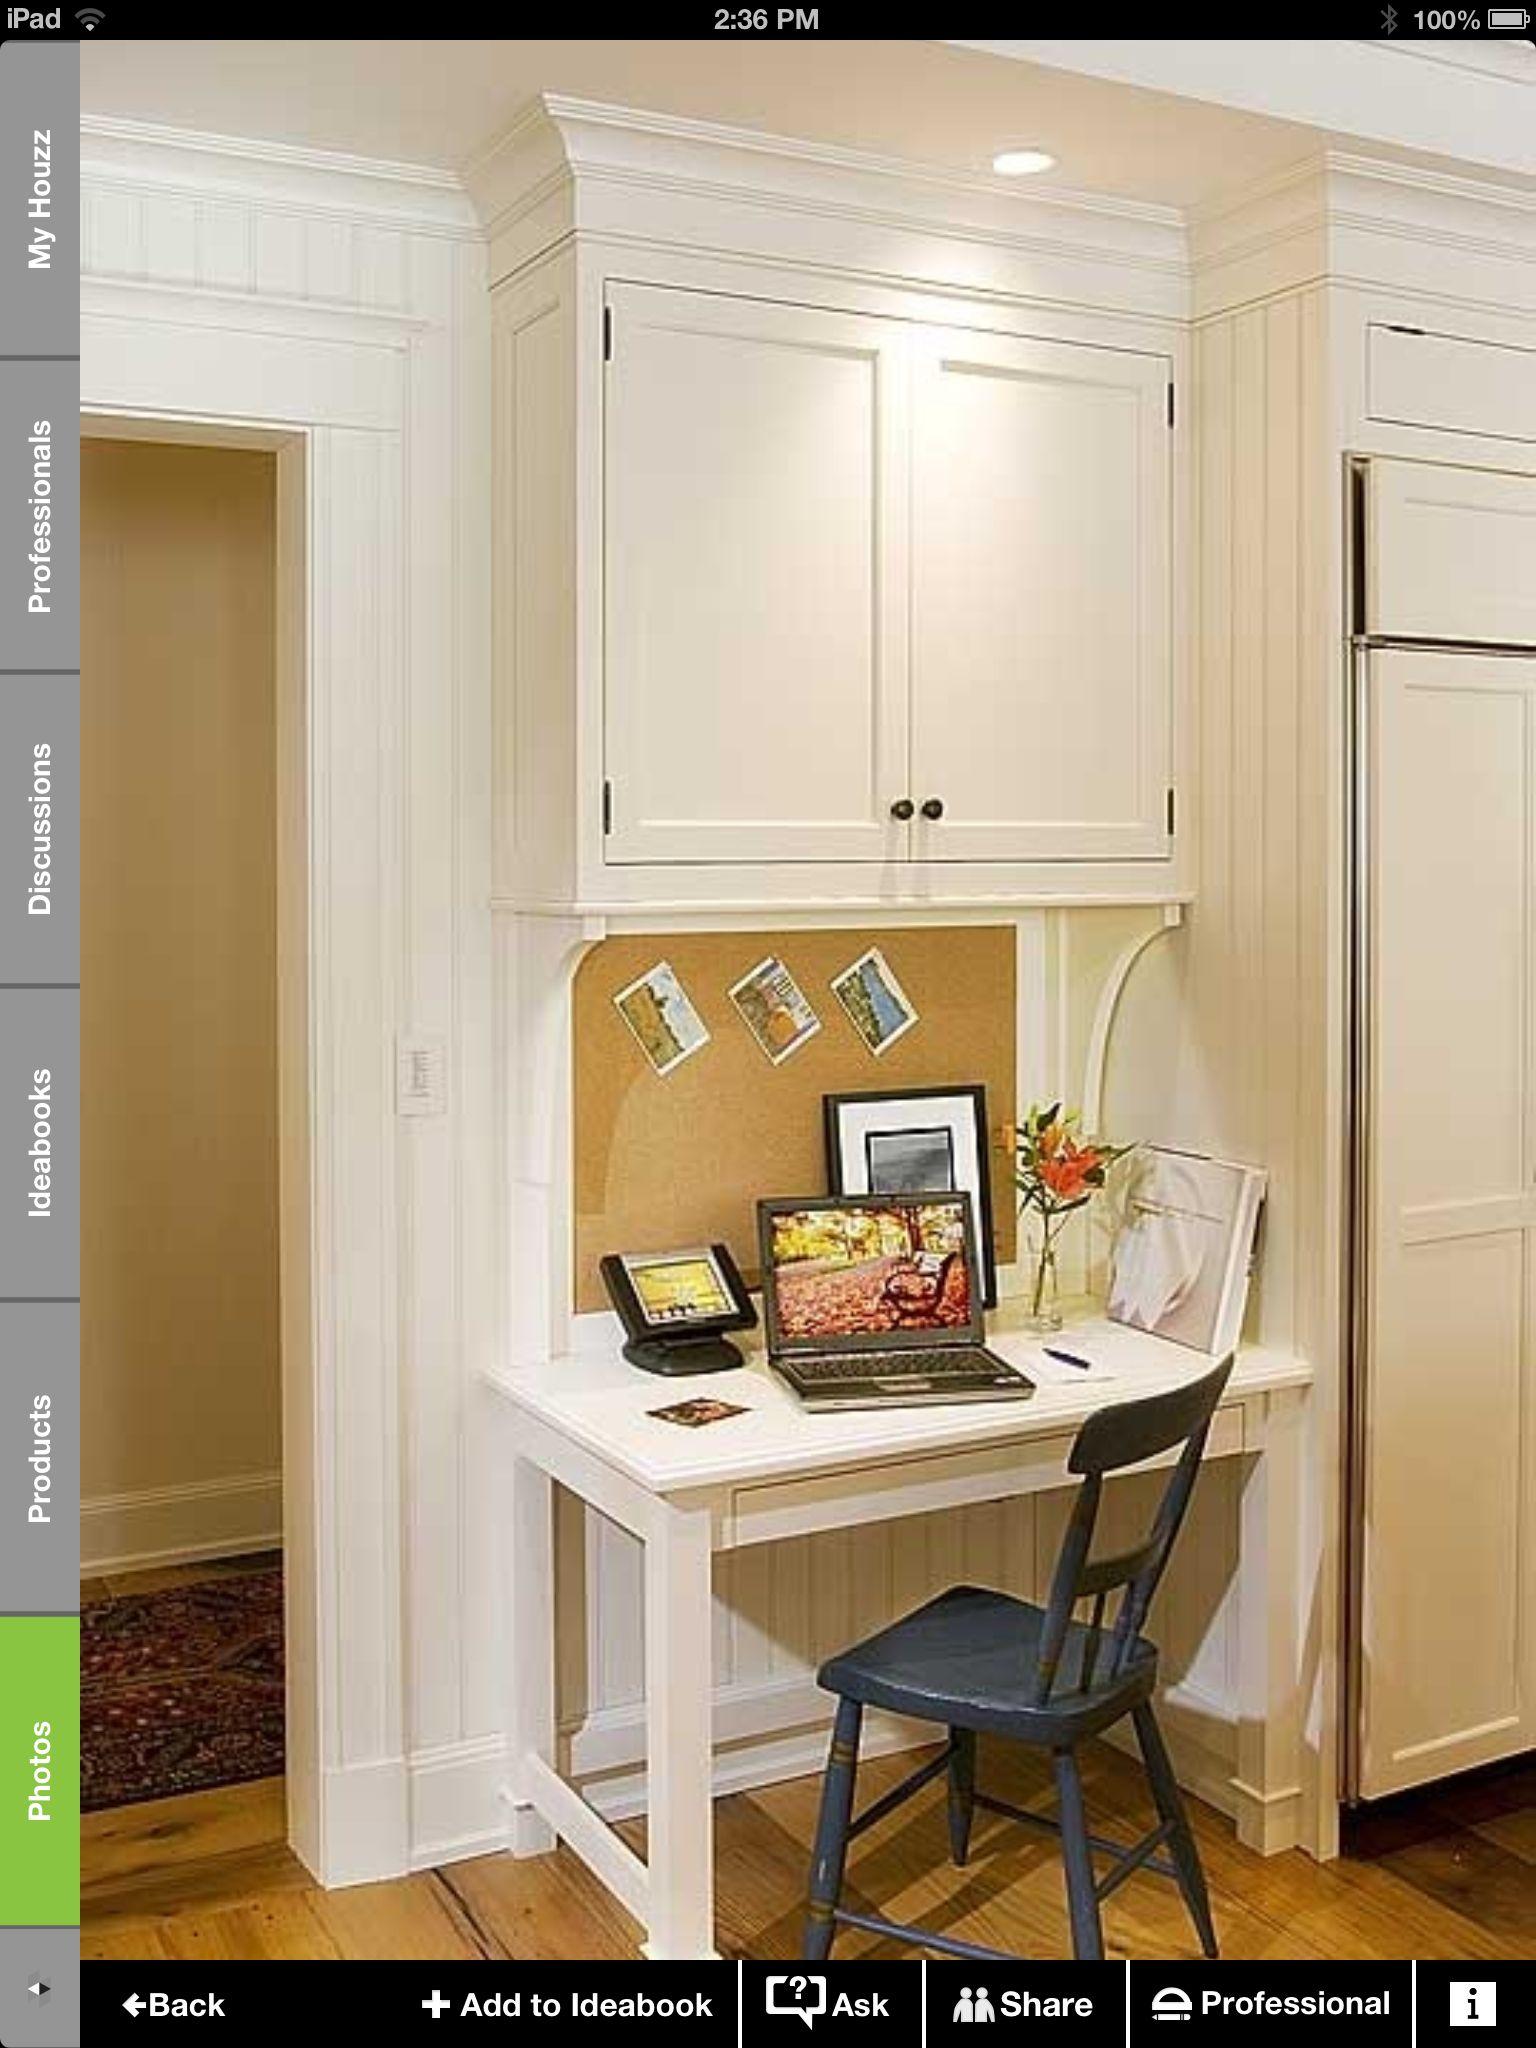 kitchen desk ideas home depot storage cabinets small future pinterest